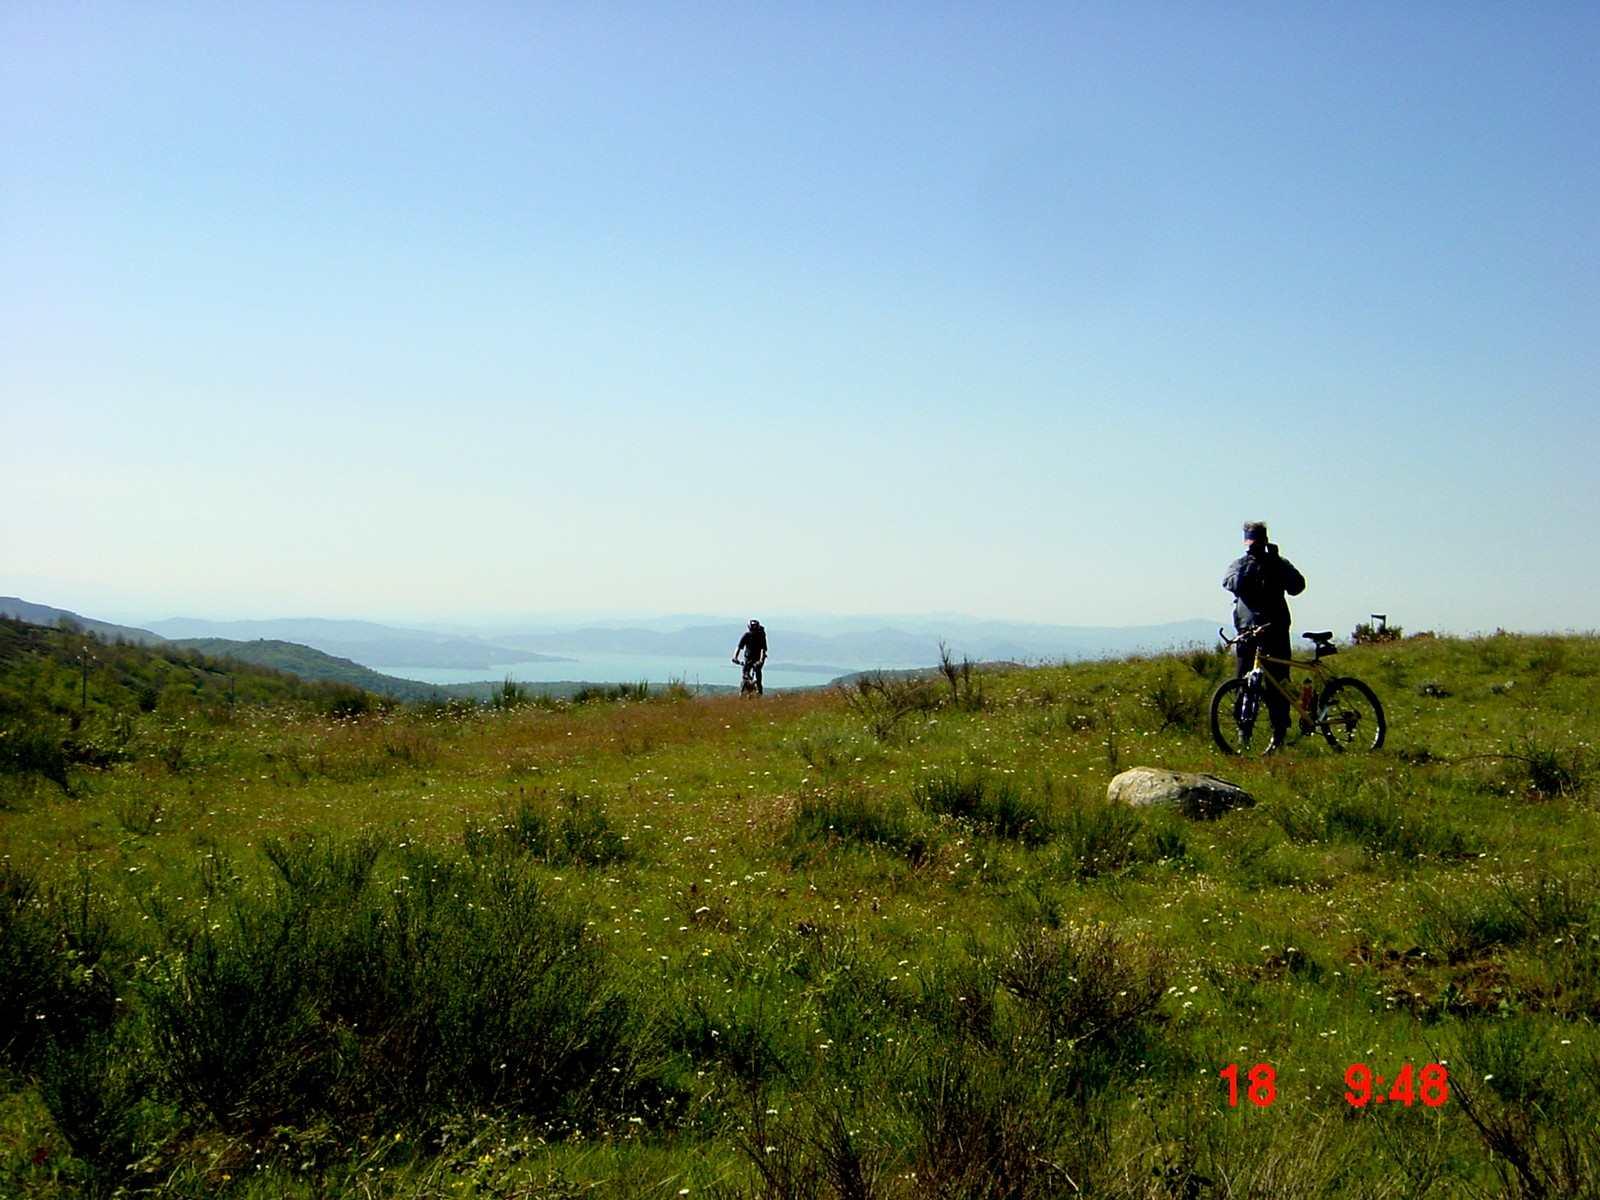 Foto: Manfred Karl / Mountainbike Tour / Monte Ginezzo, 928 m / Blick zum Trasimener See / 20.06.2007 06:20:09